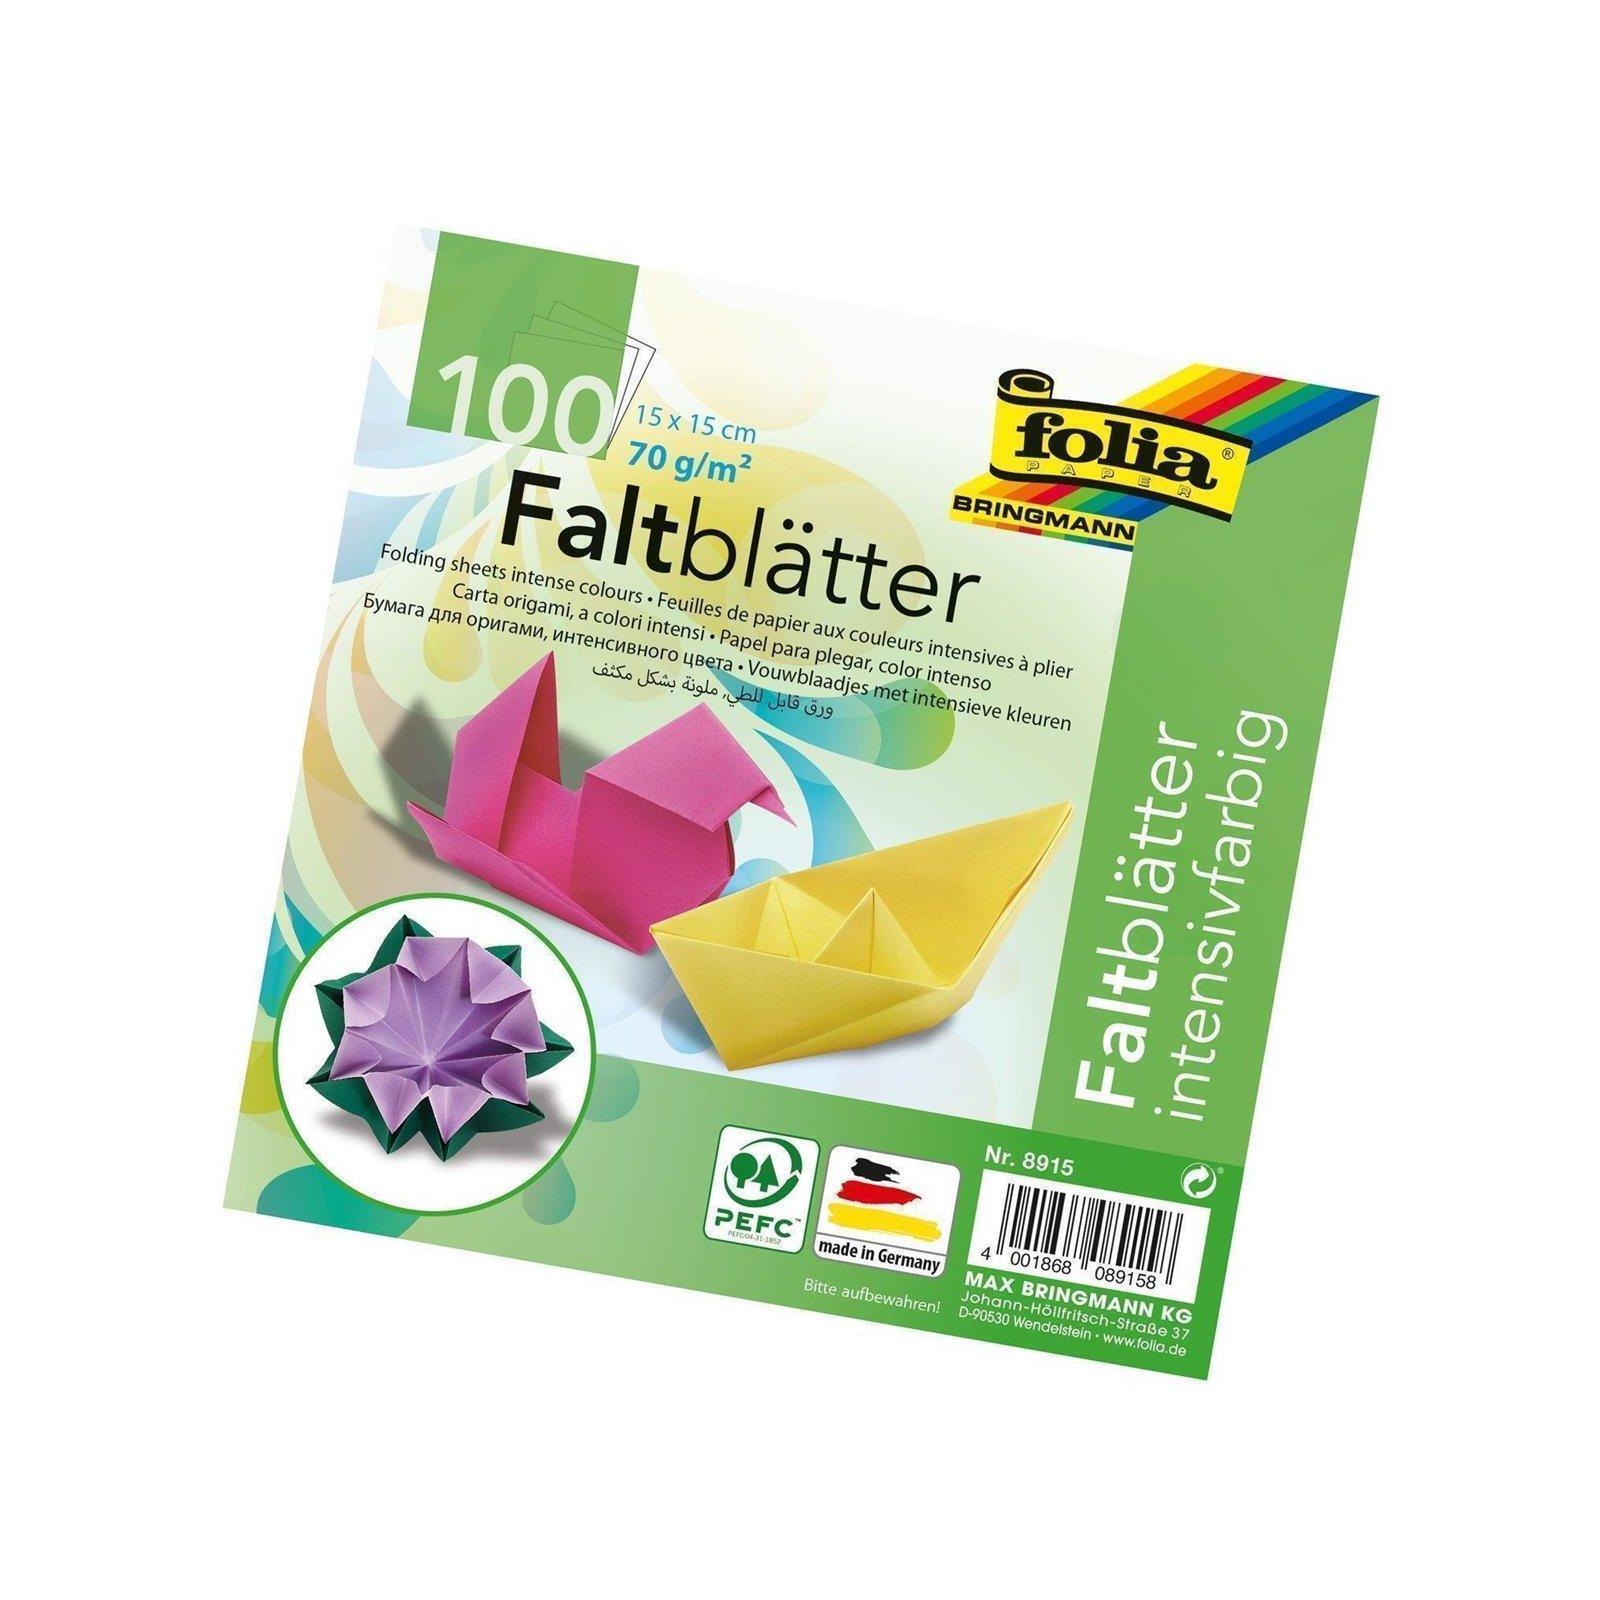 folia Faltblätter 150 x 150 mm 70 g//qm 100 Blatt durchgefärbtes Papier